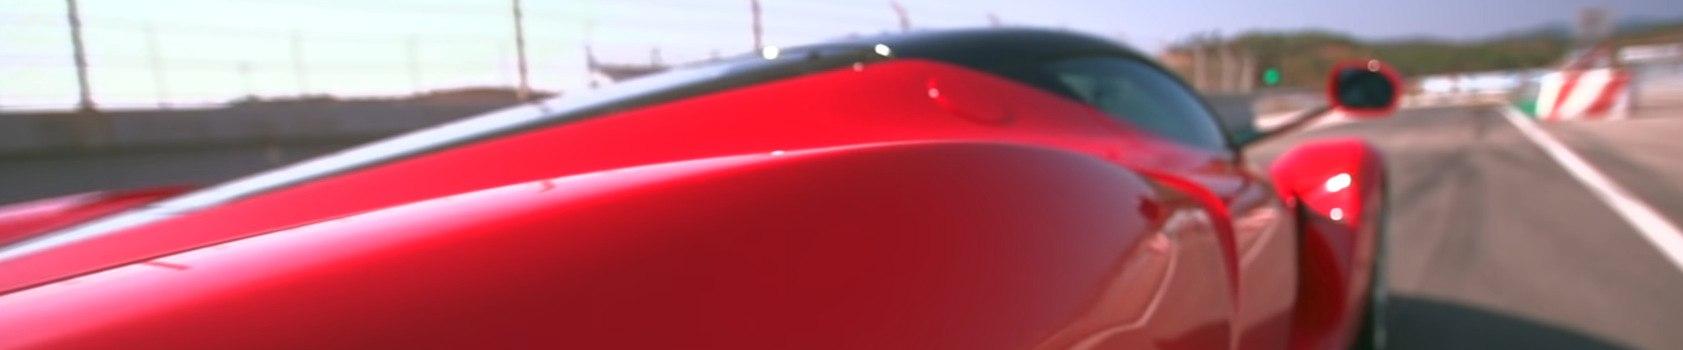 Car Youtbe channels - red Ferrari